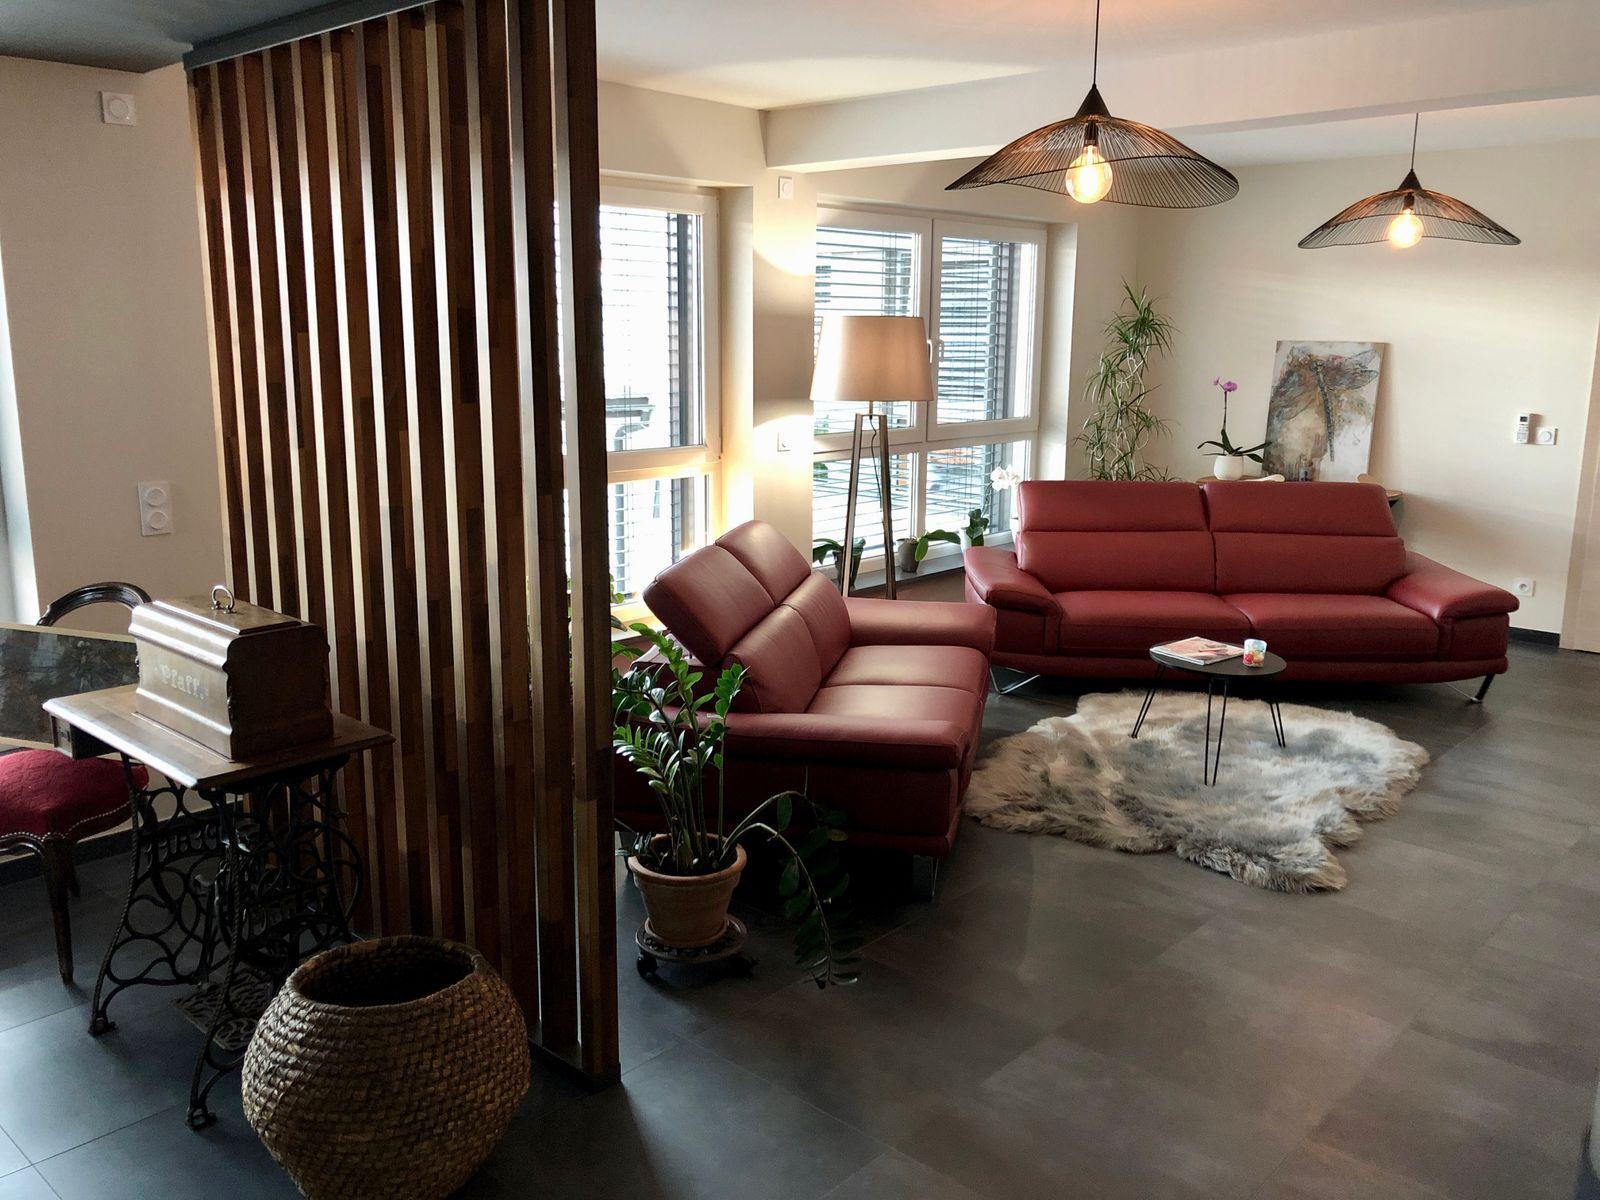 Location Chambres d\'hôtes à ROHRWILLER (Bas-Rhin) • Gîtes de ...